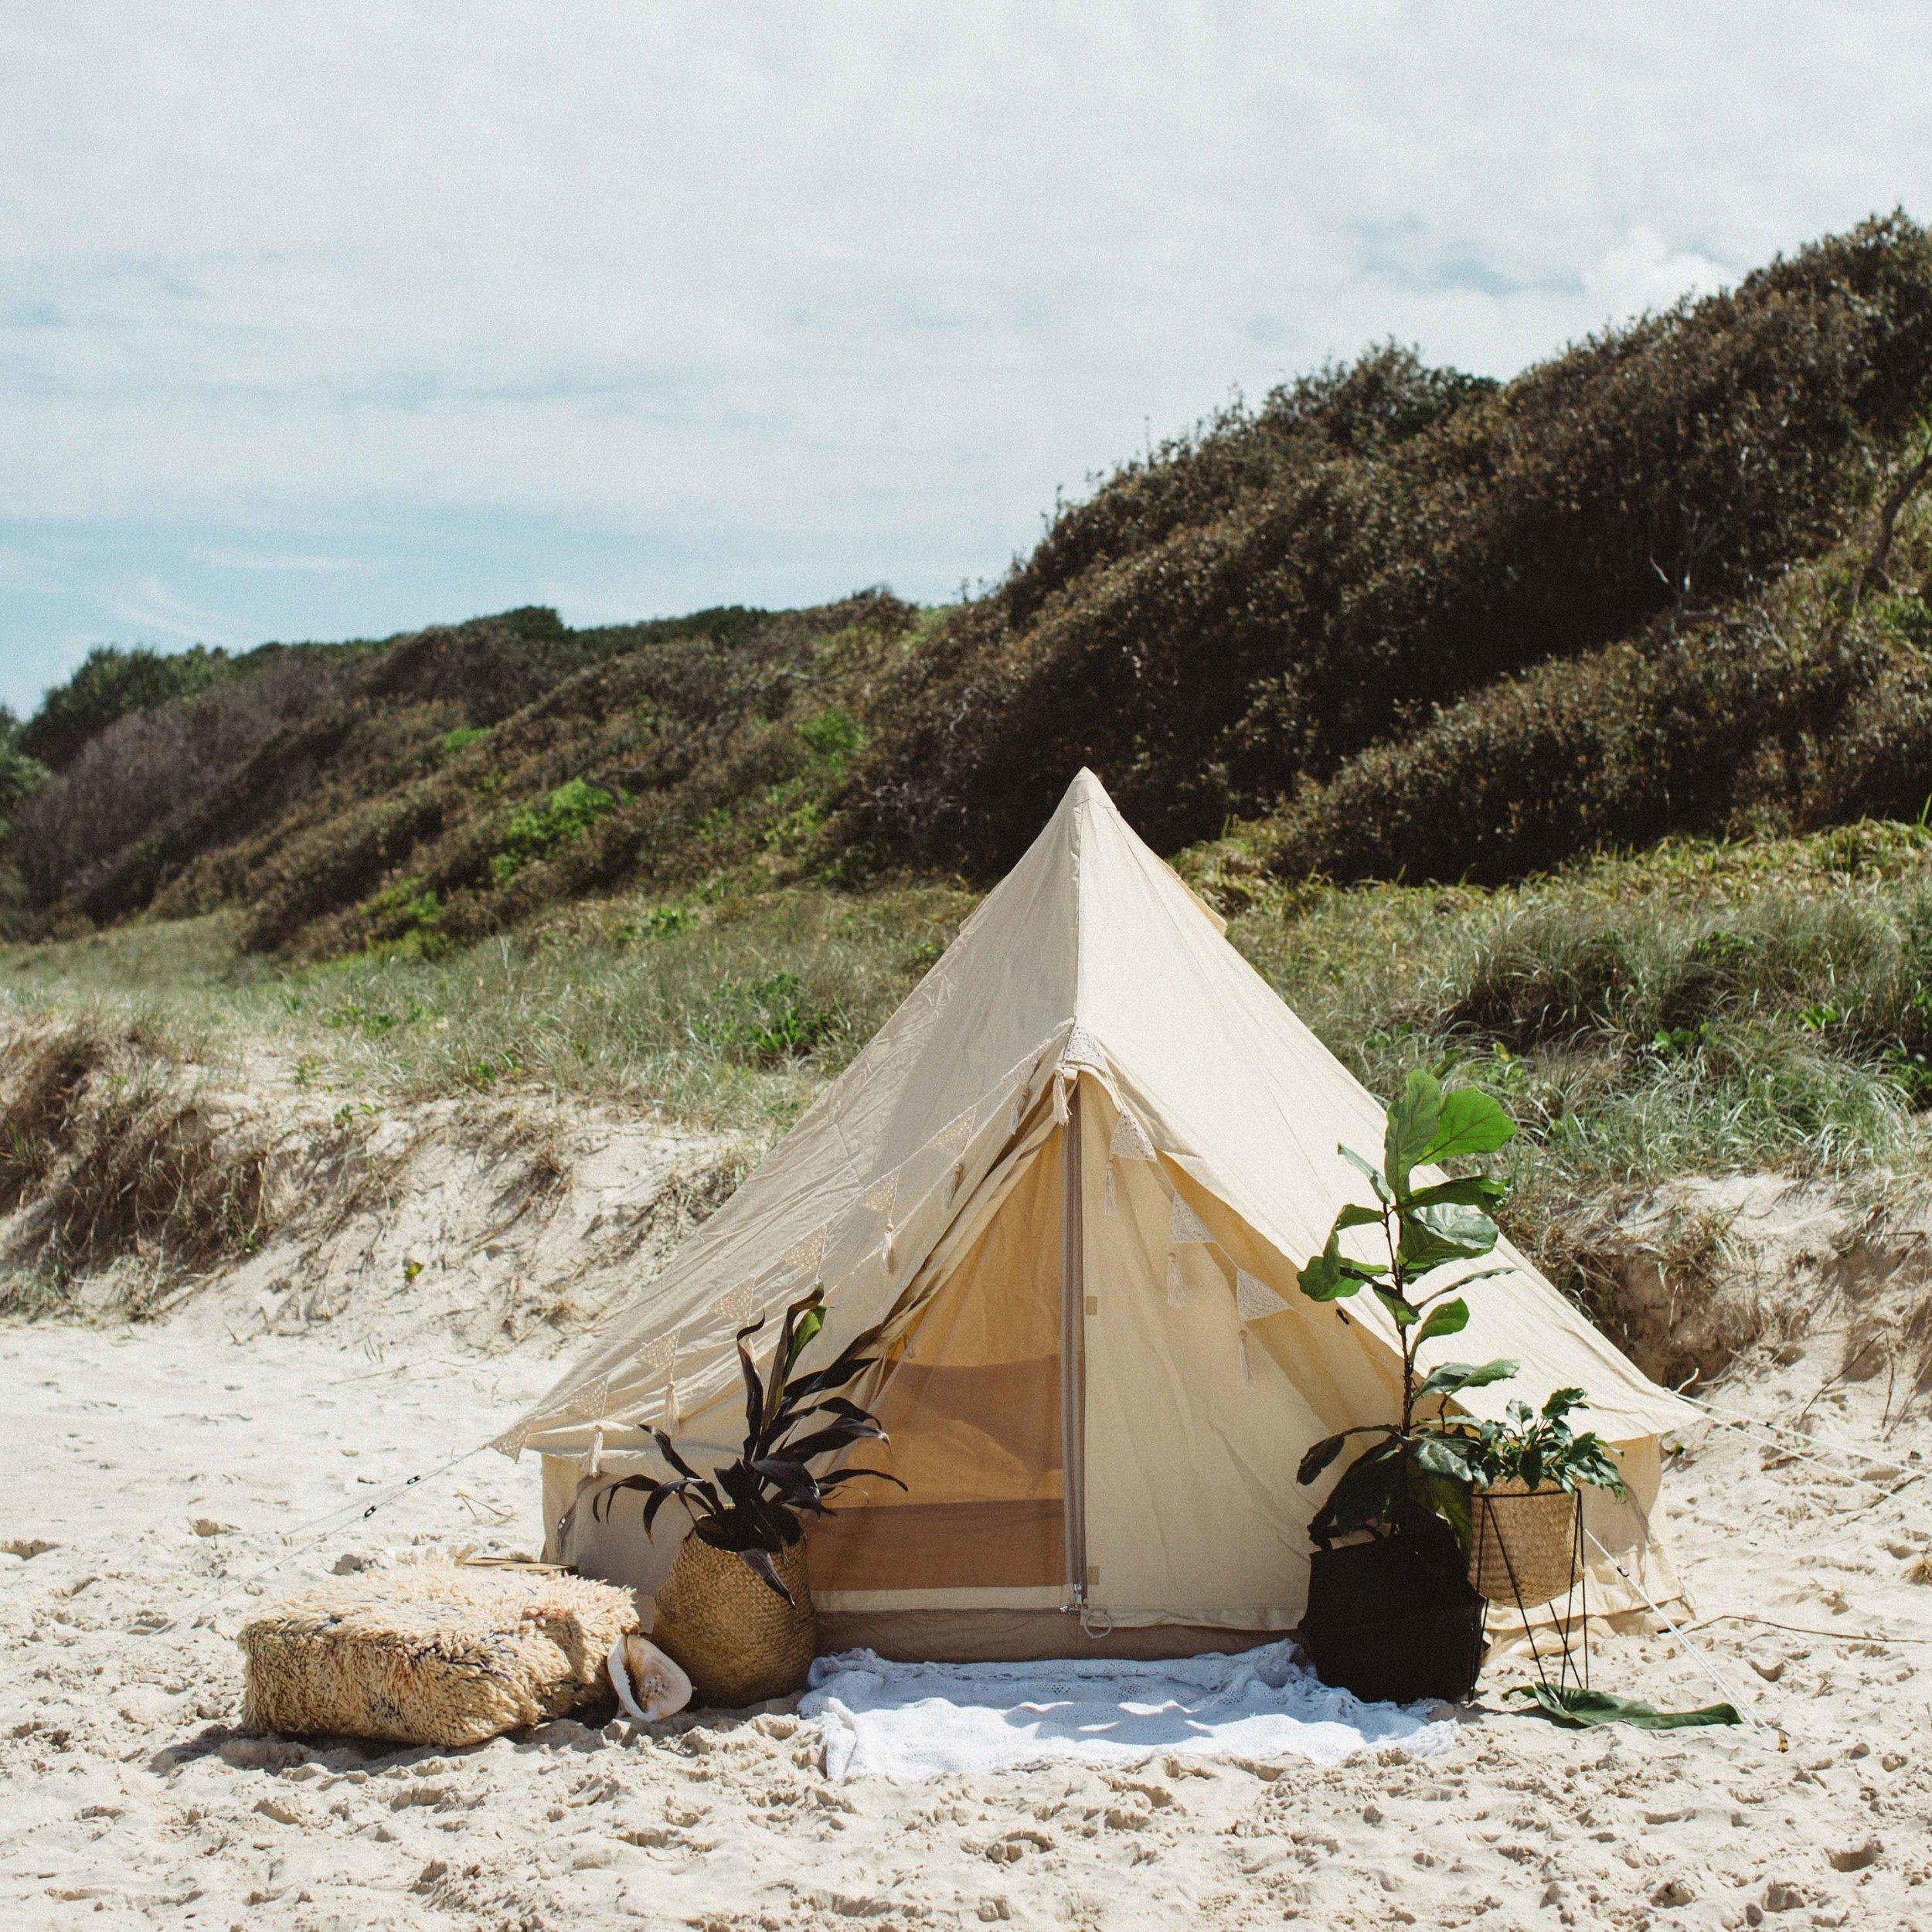 Nomad-3m-Bell-Tent-The-Seek-Society-Australia.jpg